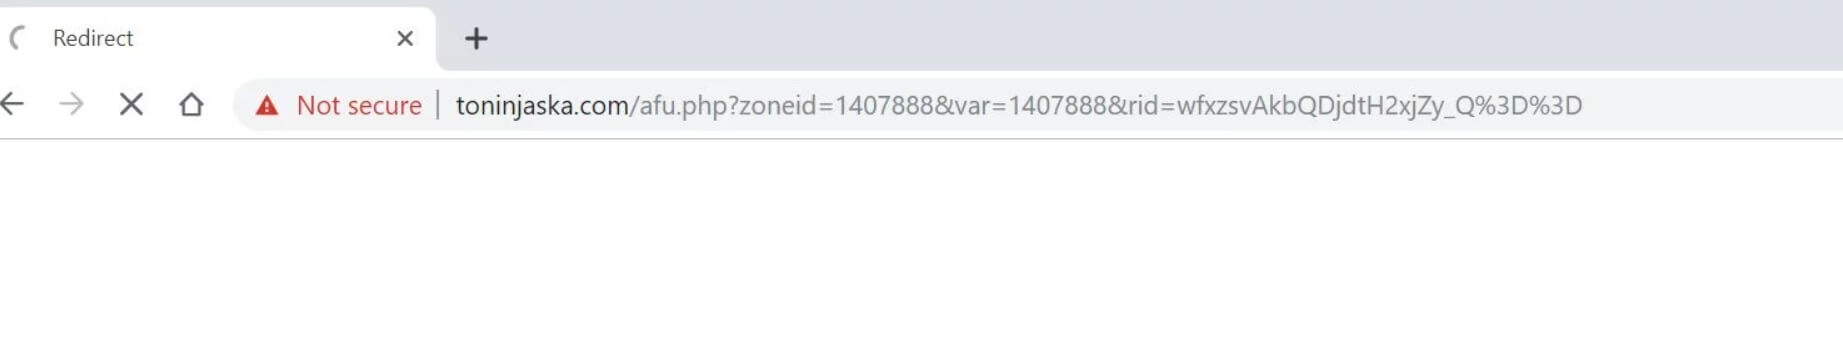 toninjaska.com redirect remove